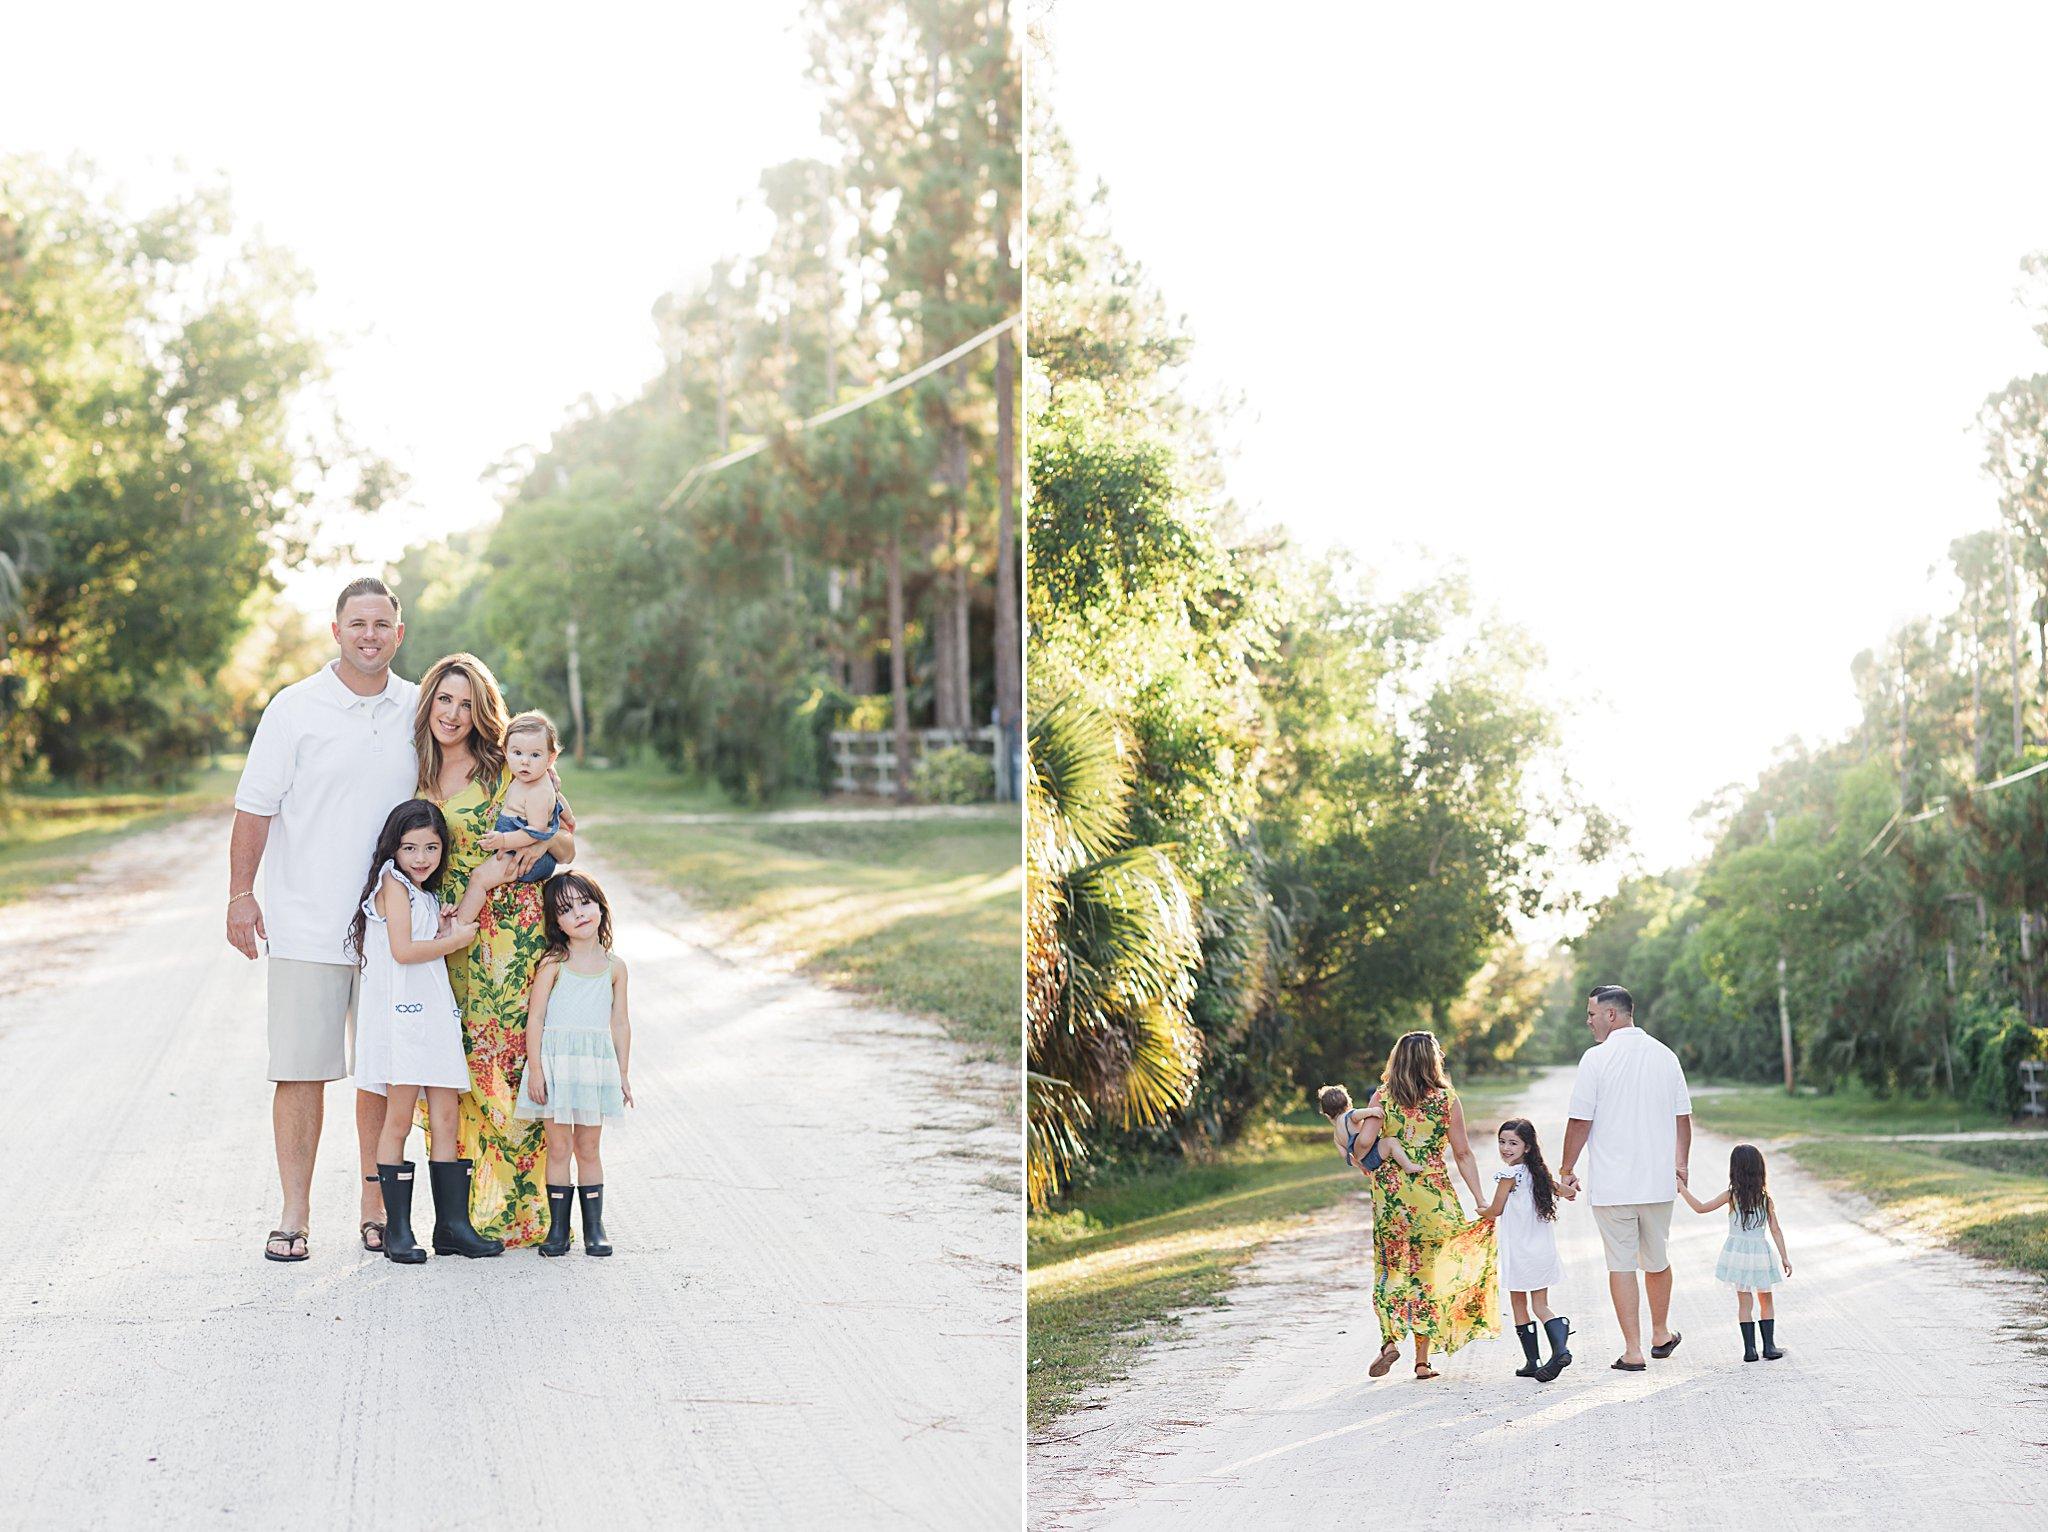 WeddingandEngagementFloridaPhotographer_2871.jpg